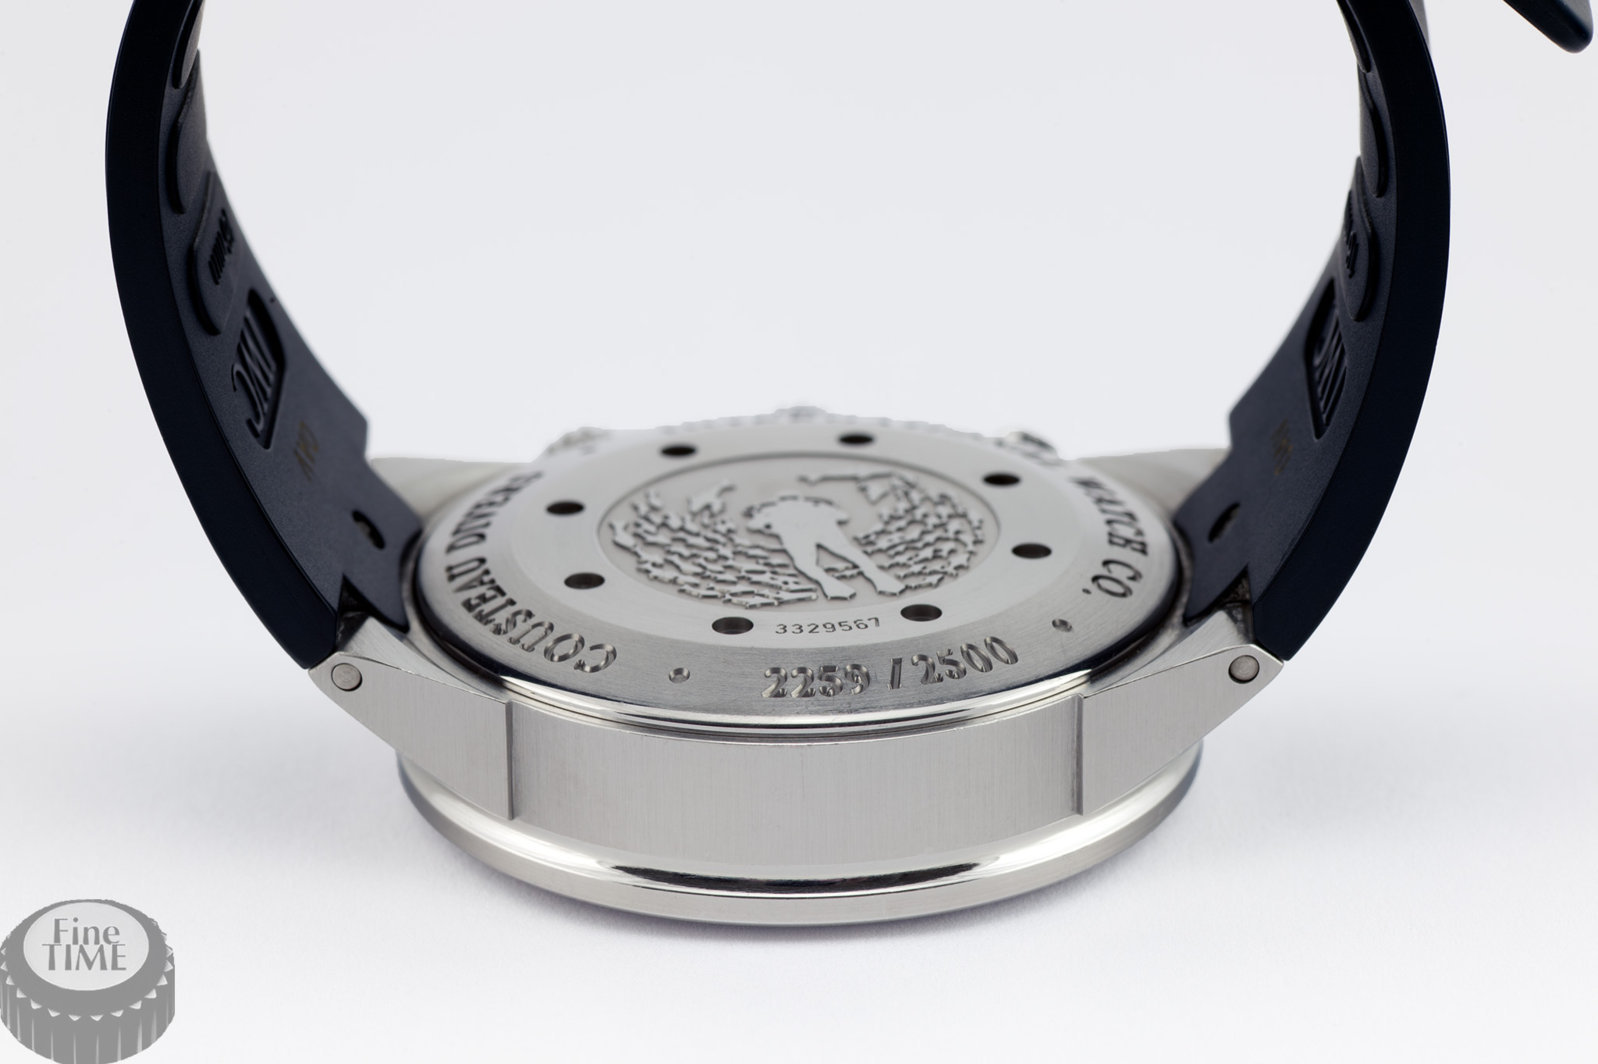 iwc-aquatimer-chronograph-cousteau-divers-iw378101-04.jpg